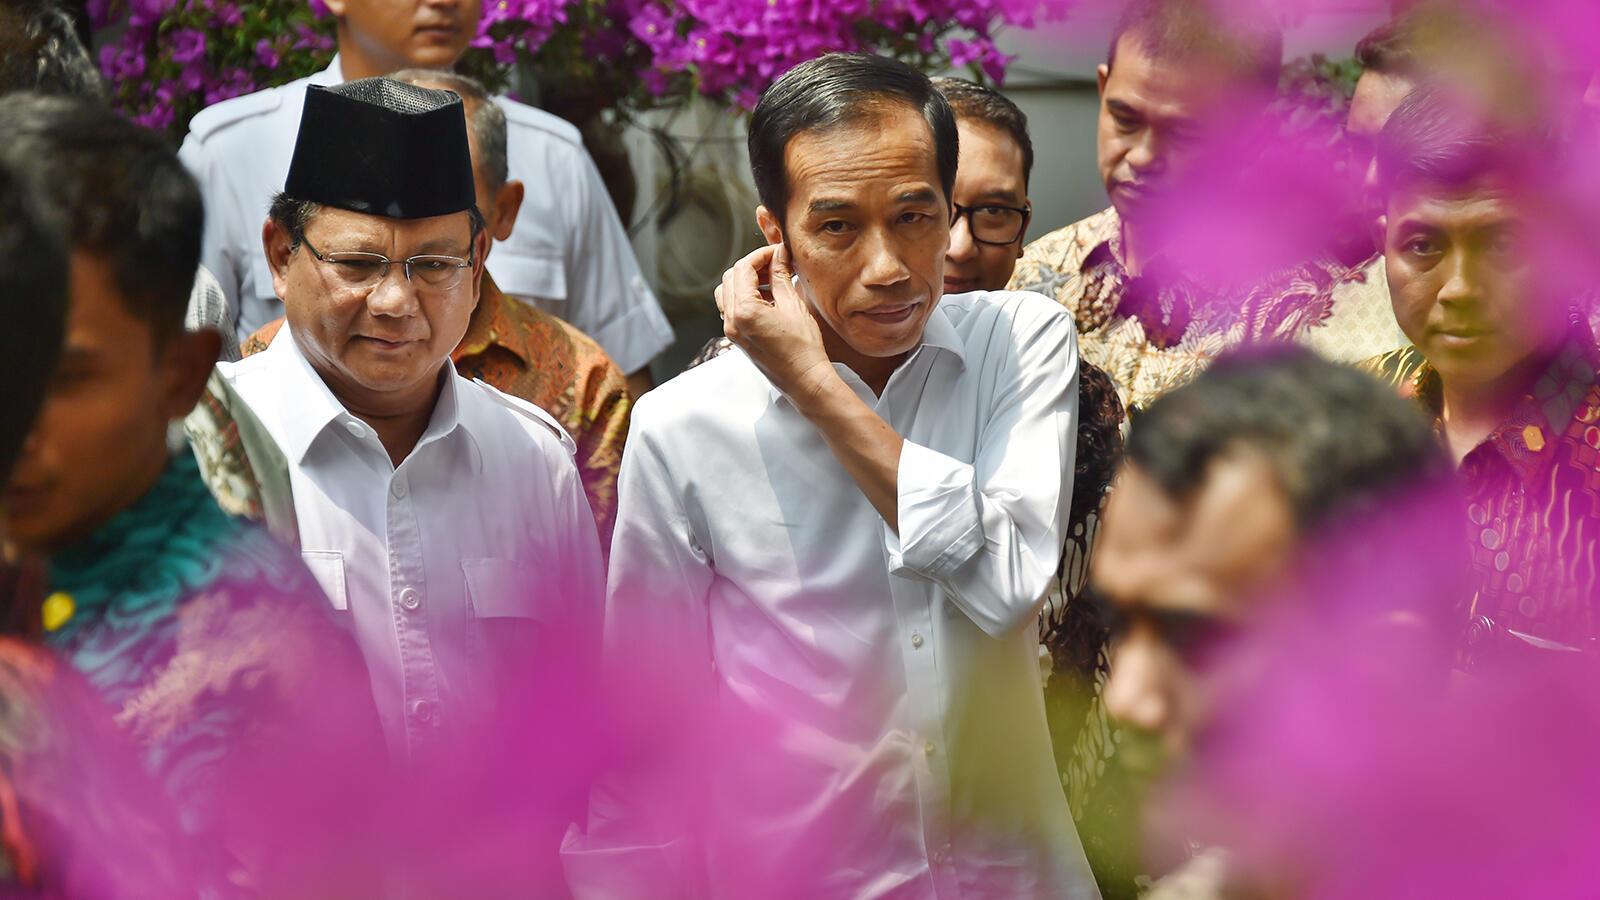 LSI Denny JA: Jokowi Dongkrak Suara PDIP, Prabowo Kerek Gerindra